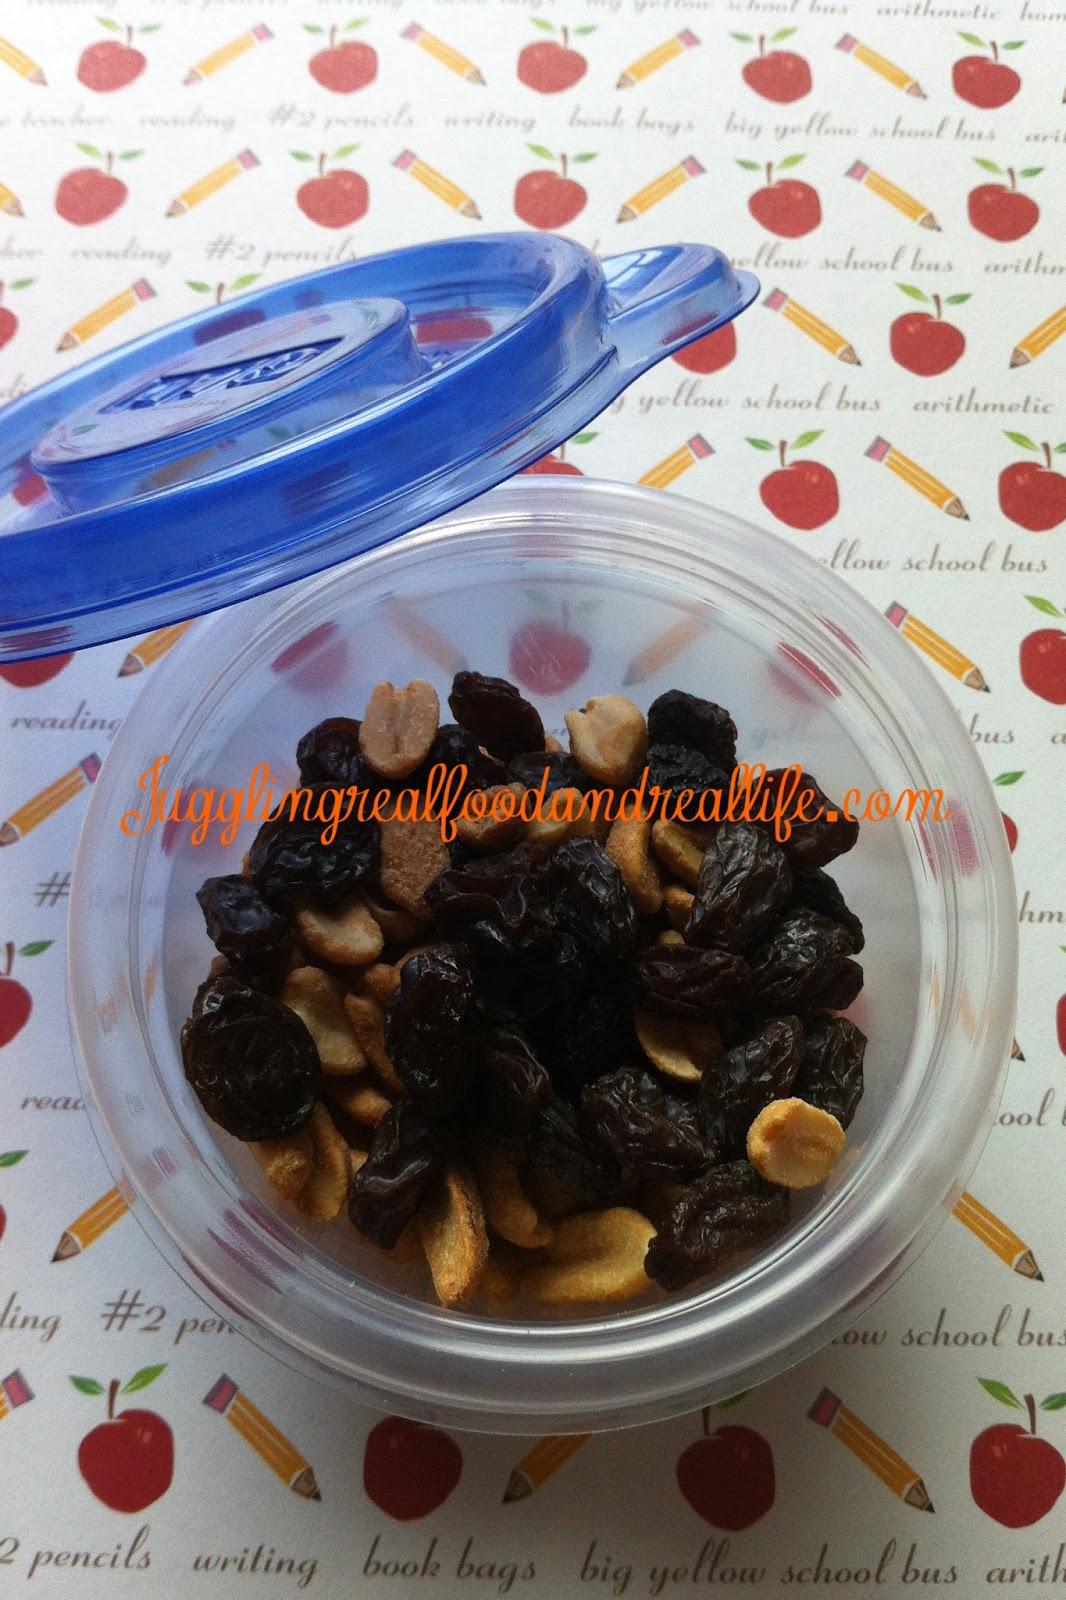 Peanut and raisin trail mix